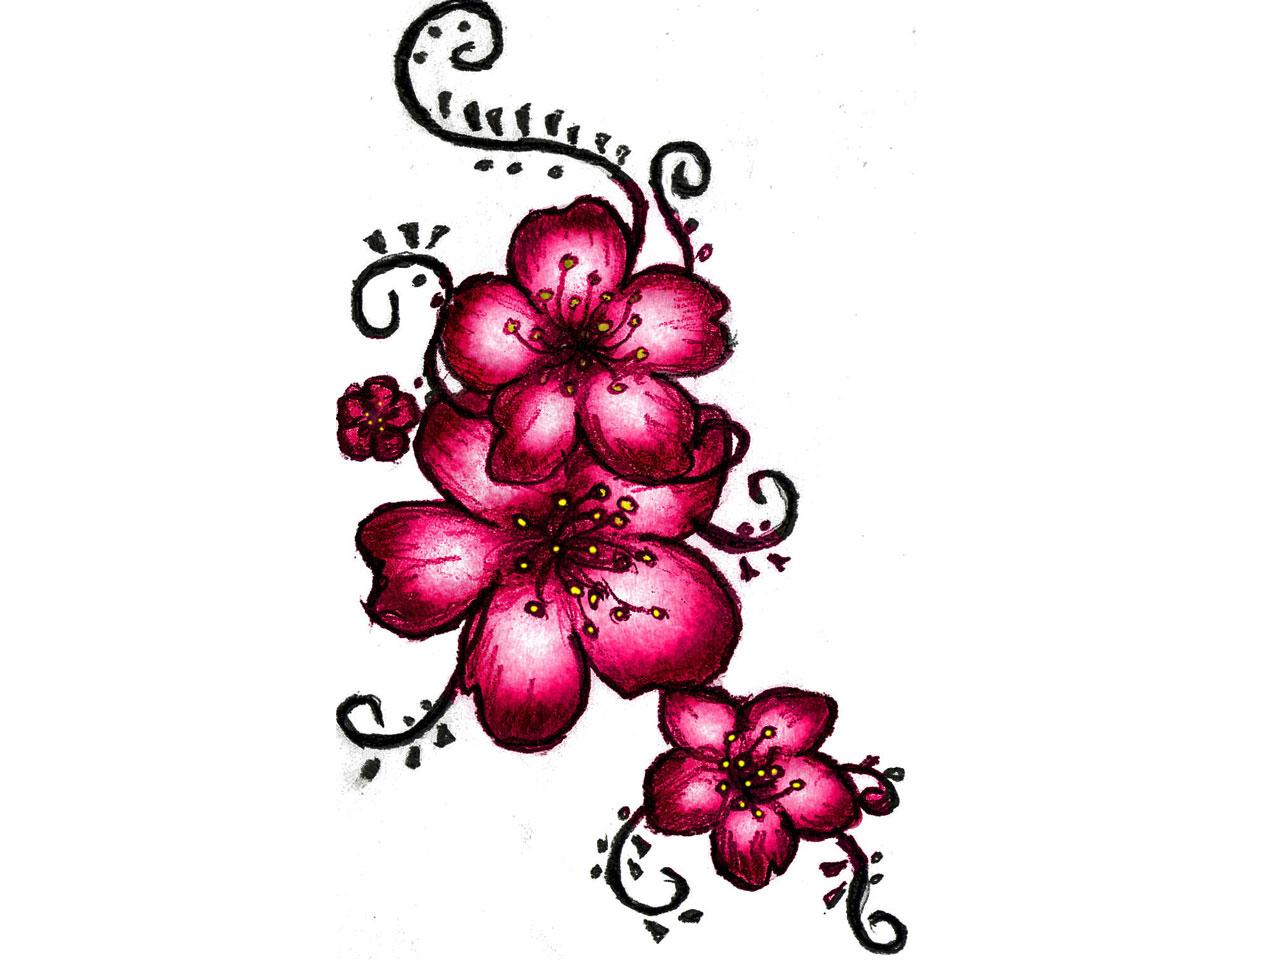 Drawn sakura blossom red Blossom drawing blossom love I